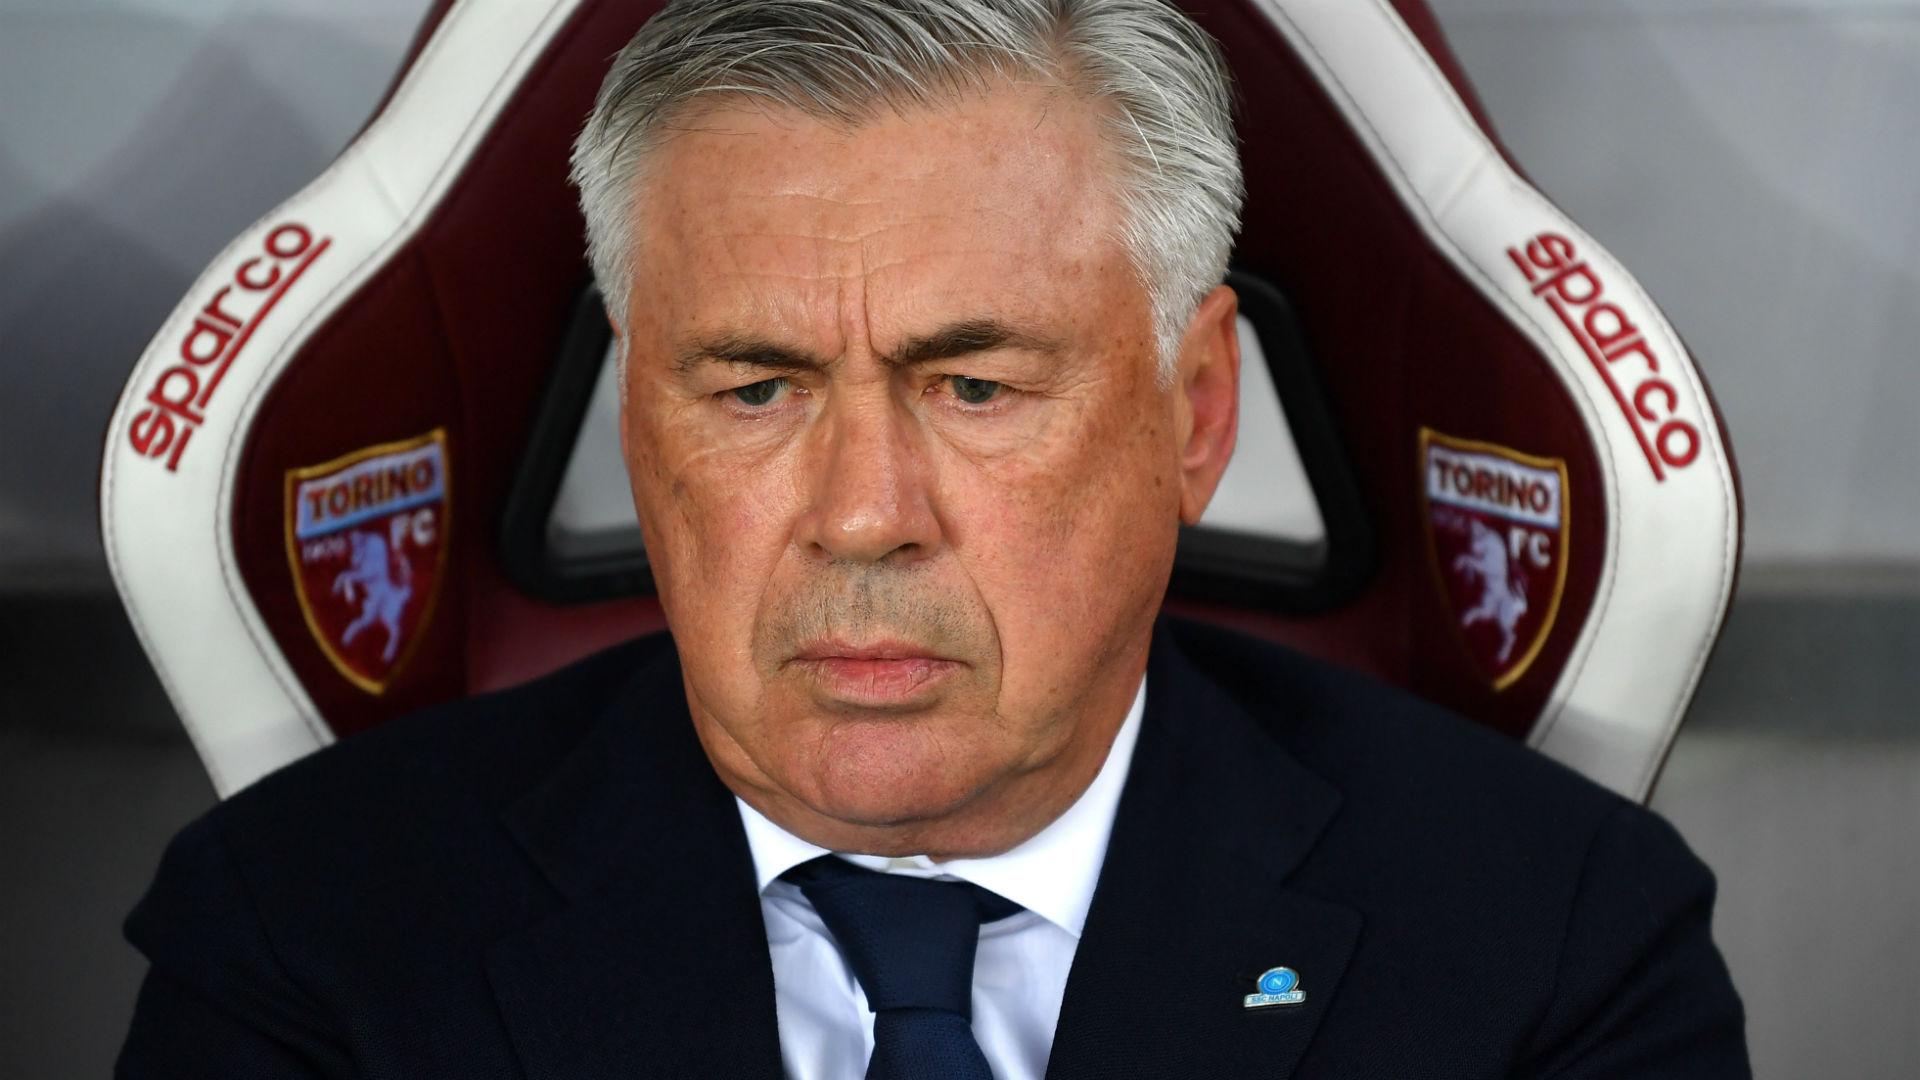 Rummenigge a pleuré en virant Ancelotti du Bayern Munich